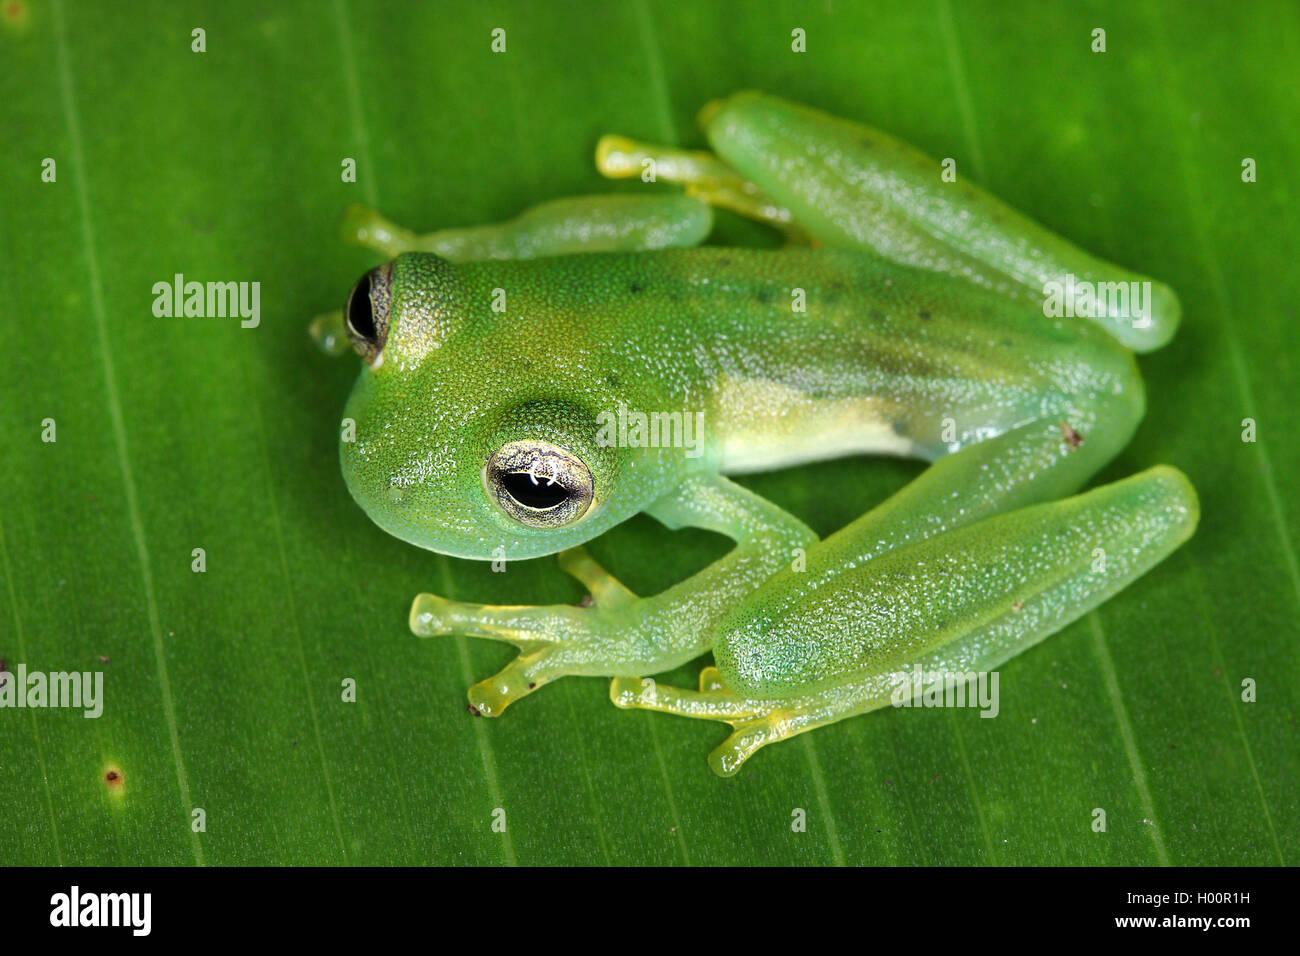 Glasfrosch, Glas-Frosch, Espadarana prosoplepon (Espadarana prosoplepon, Centrolena prosoplepon), sitzt auf einem - Stock Image